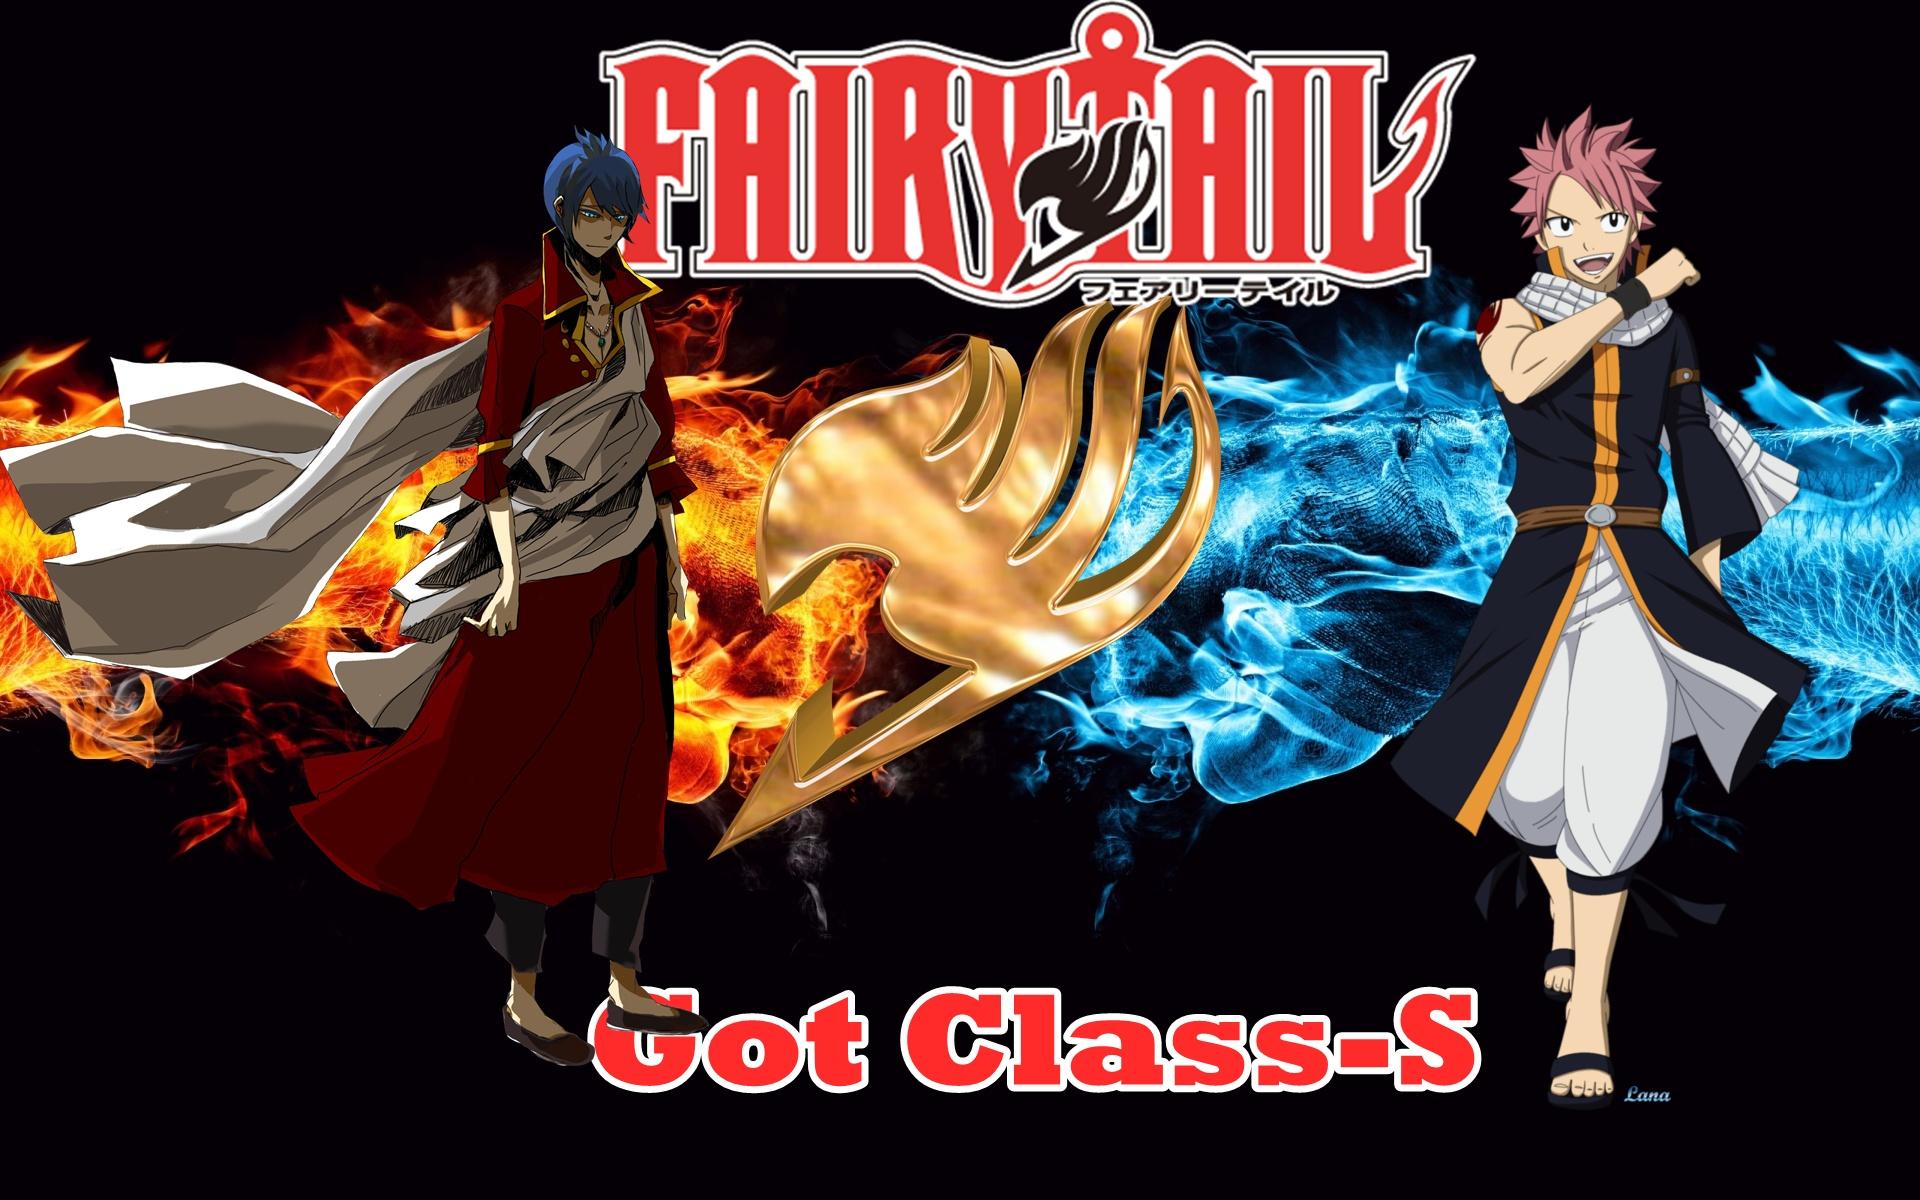 Fairy Tail Got Class S V 1 5 Image Mod DB